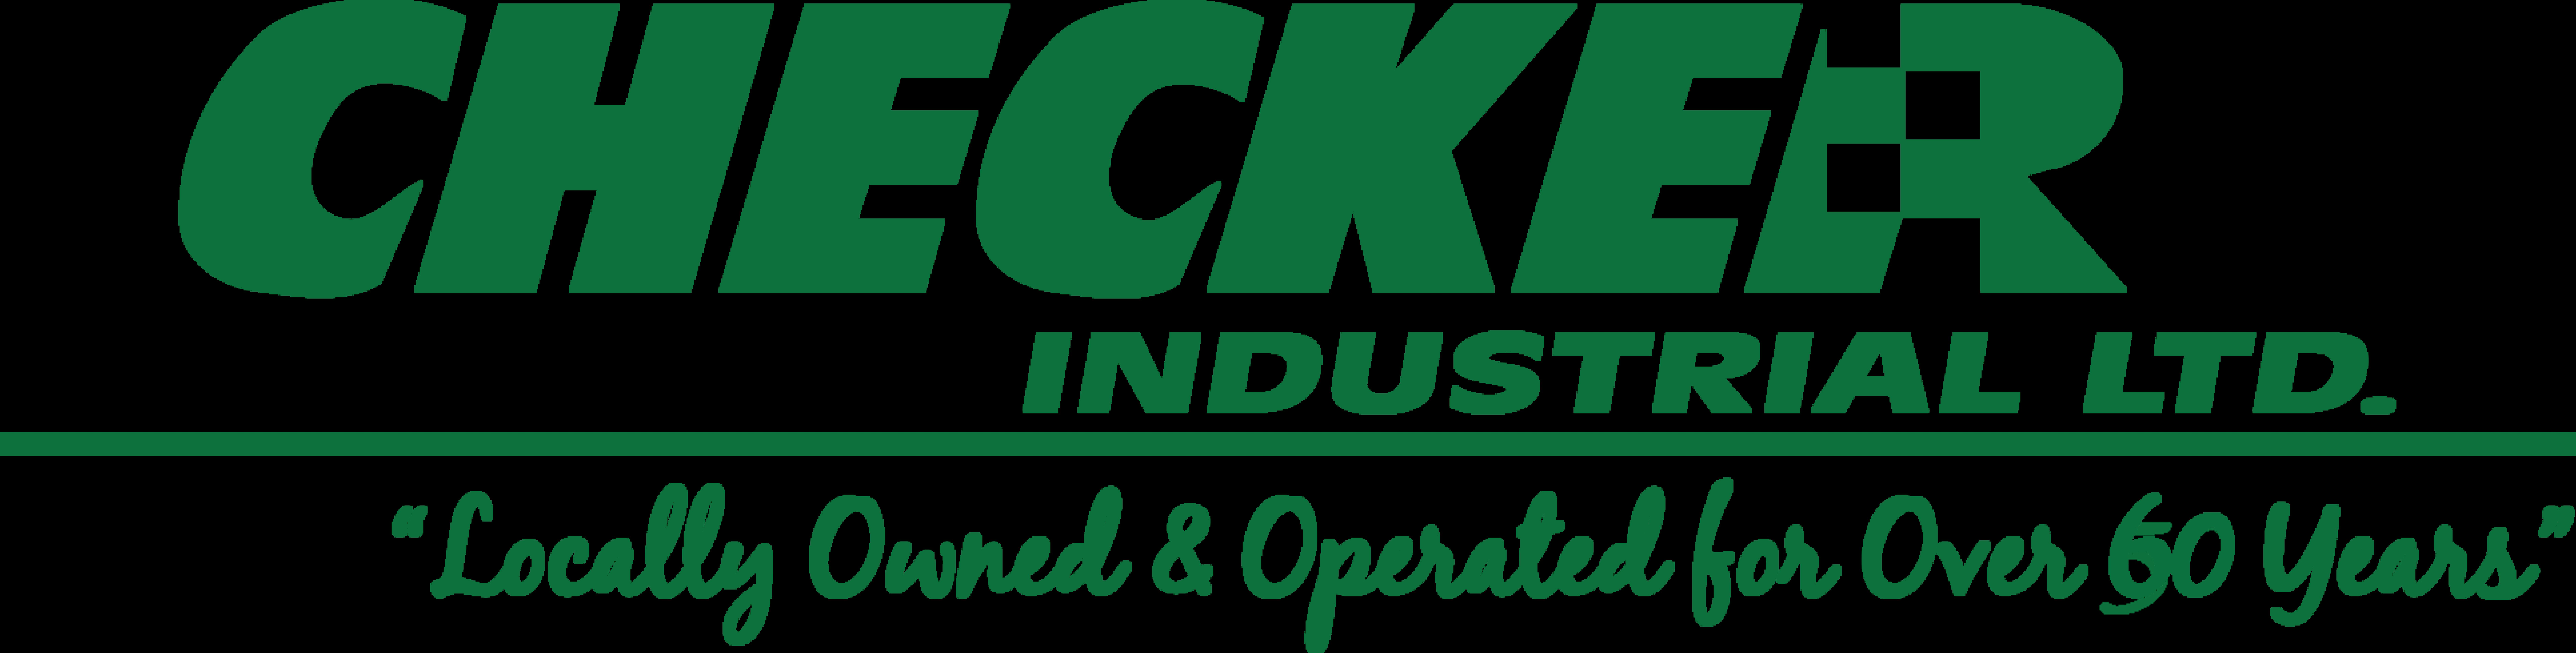 Checker Industrial Ltd.